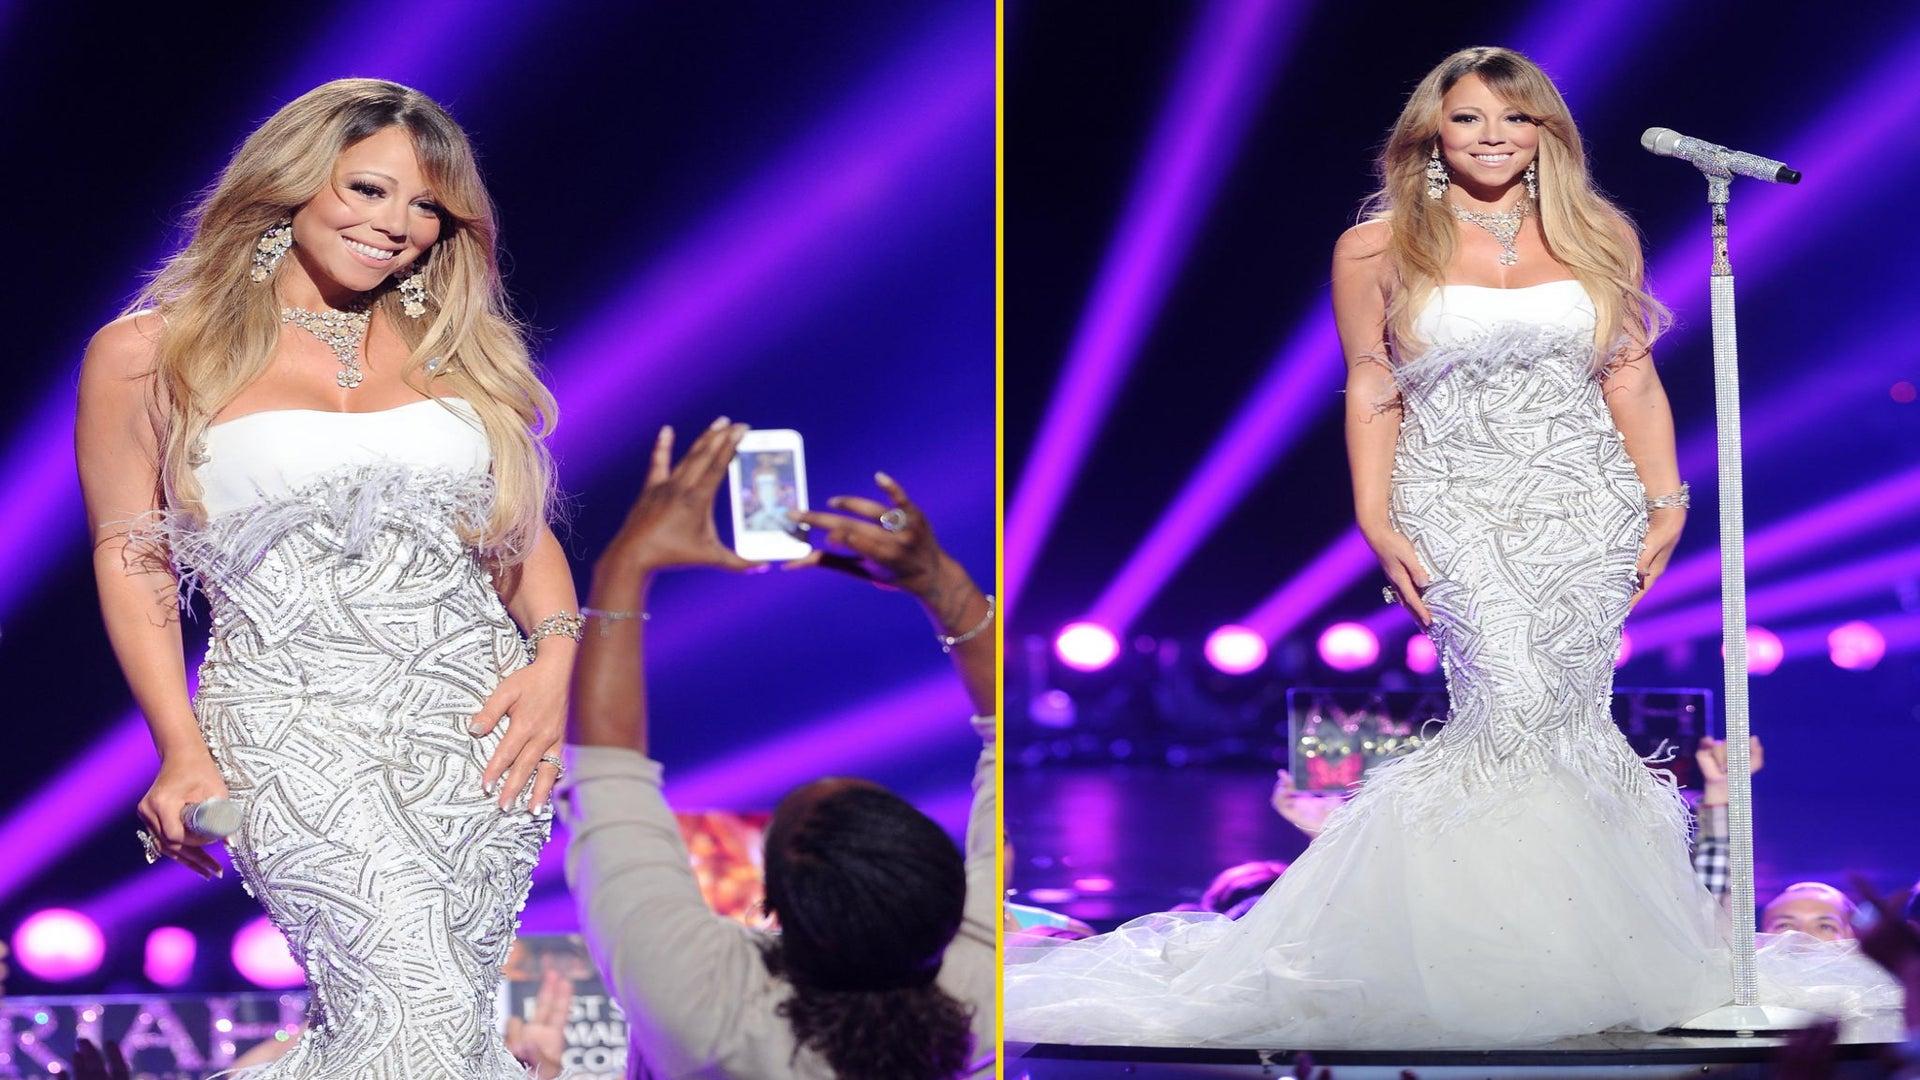 Coffee Talk: Mariah Carey to Headline Macy's 4th of July Show